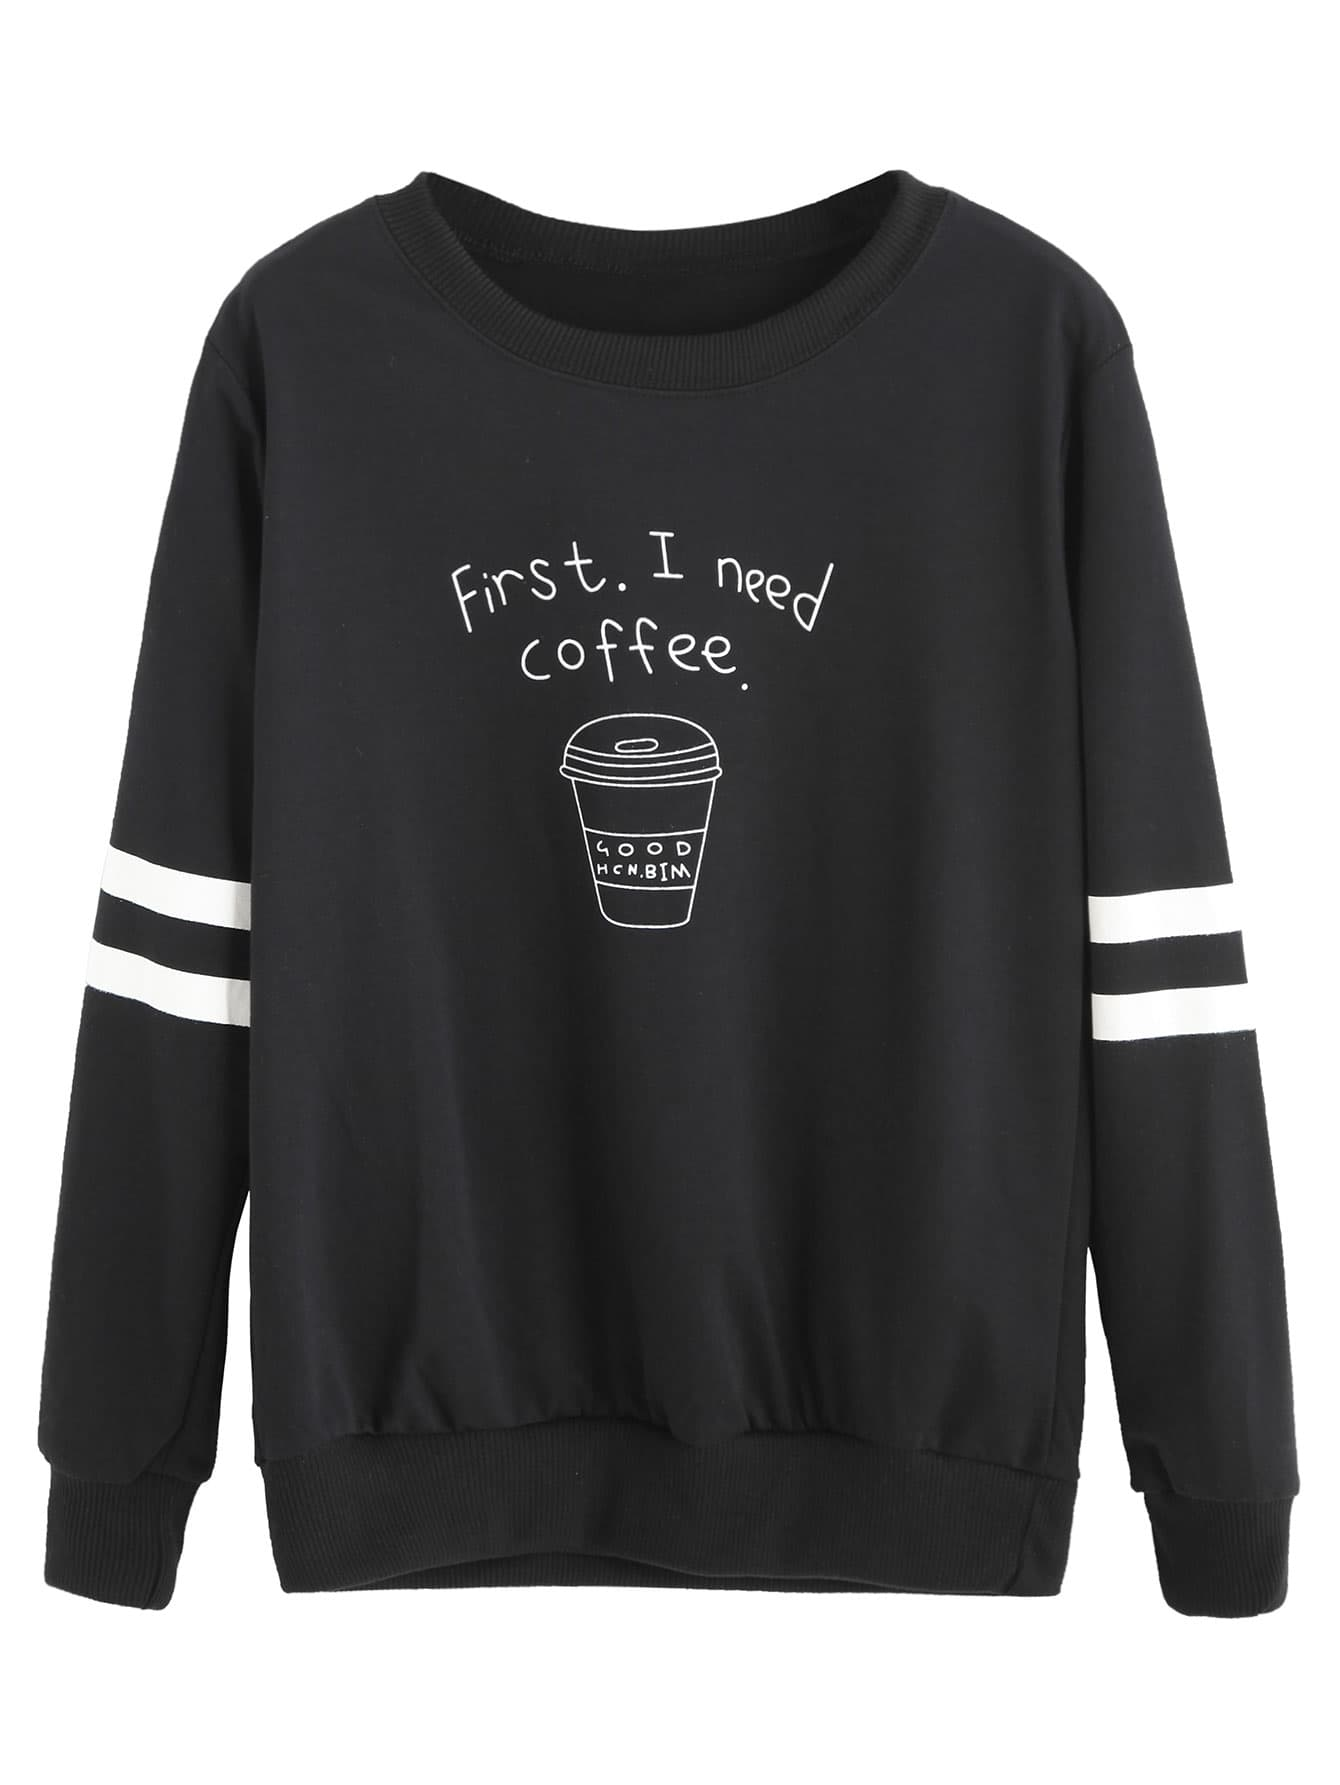 Coffee Cup Print Varsity Striped Pullover sweatshirt160907126